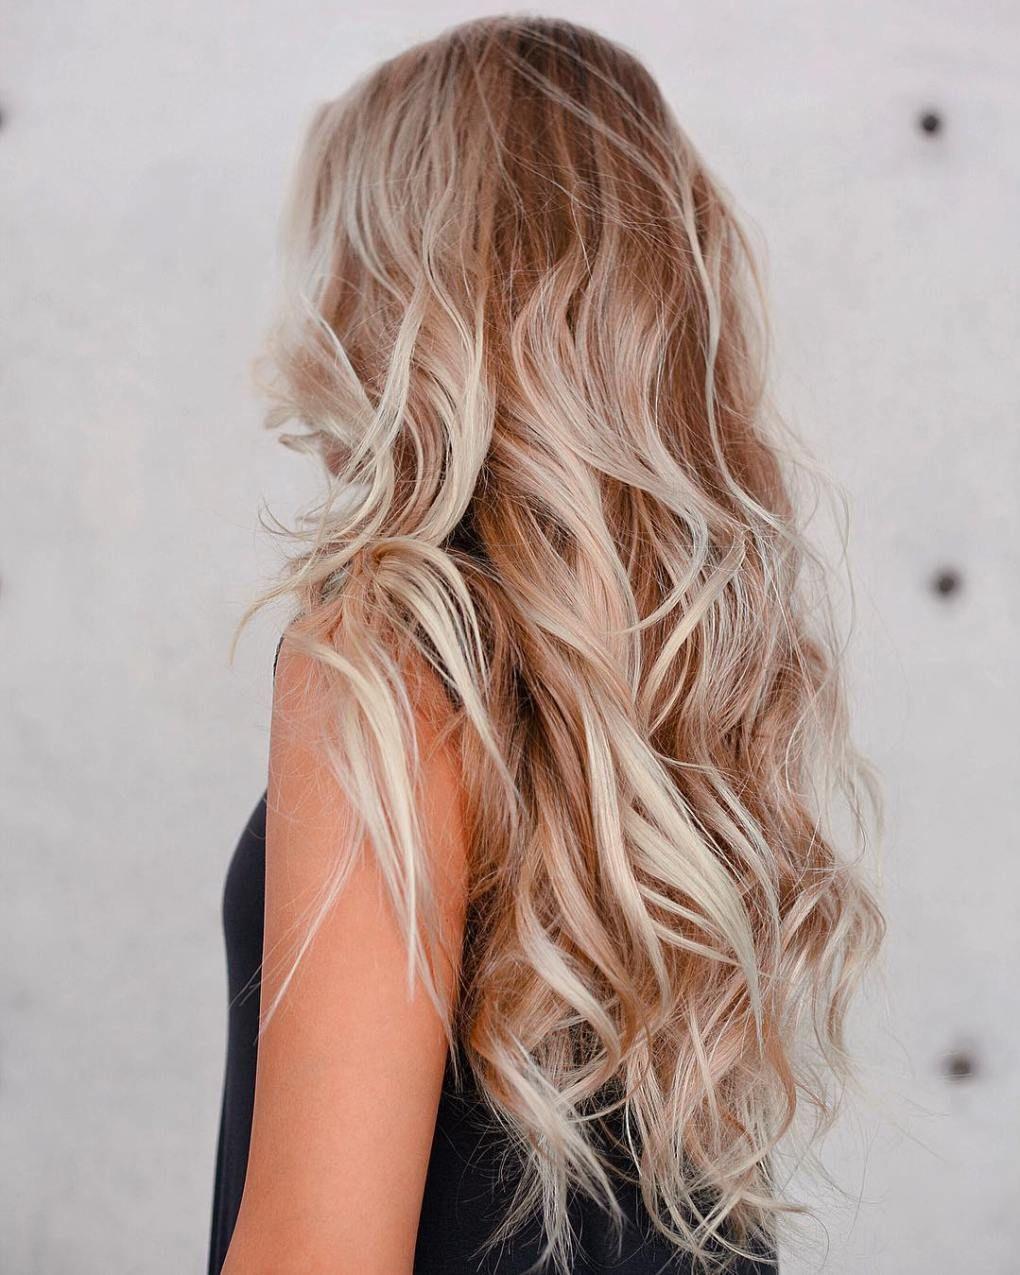 Loreal Hair color in tecom